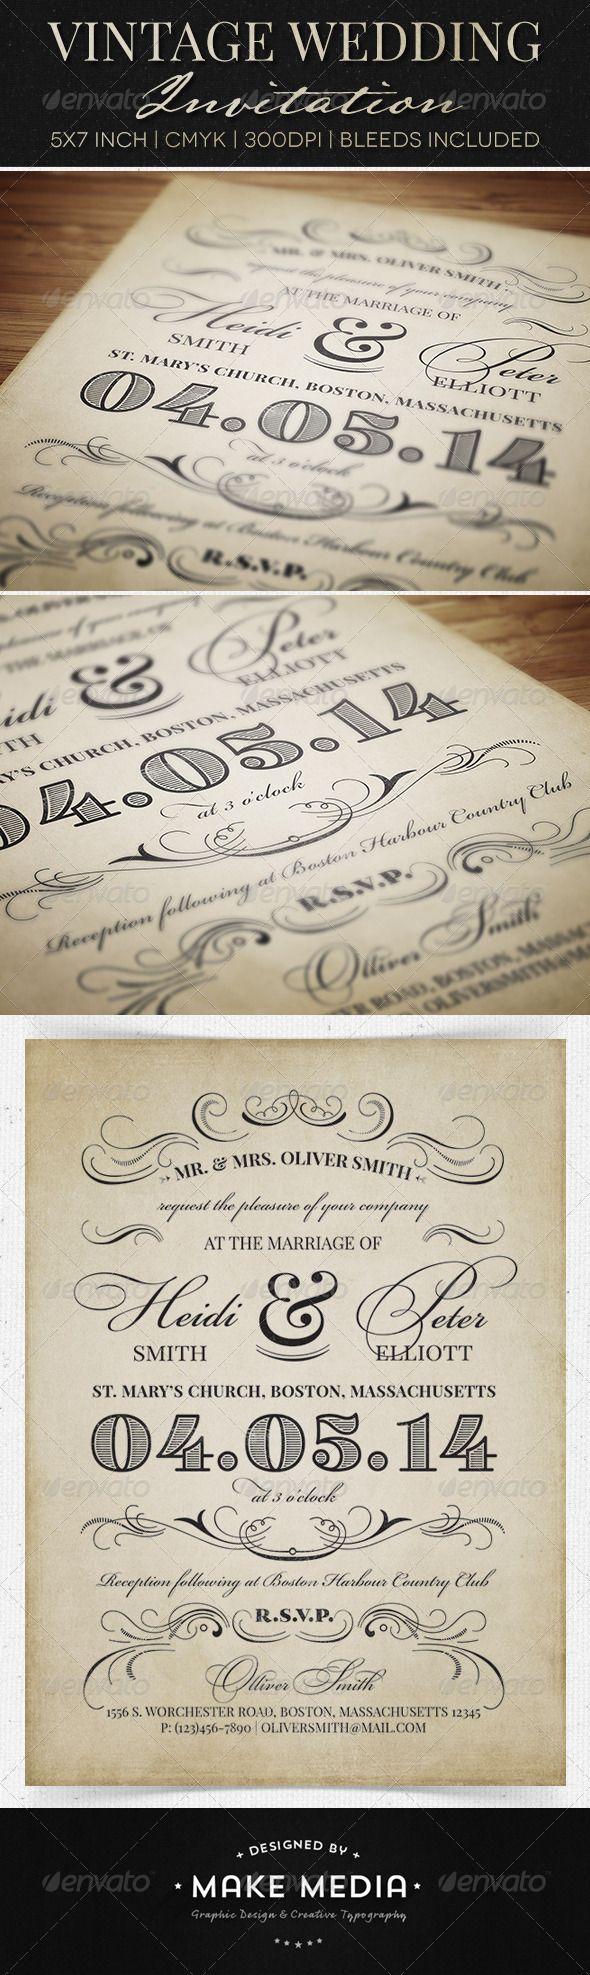 Vintage Wedding Invitation Print Templates PSD | Buy and Download: http://graphicriver.net/item/vintage-wedding-invitation/6603909?WT.ac=category_thumb&WT.z_author=MakeMediaCo&ref=ksioks